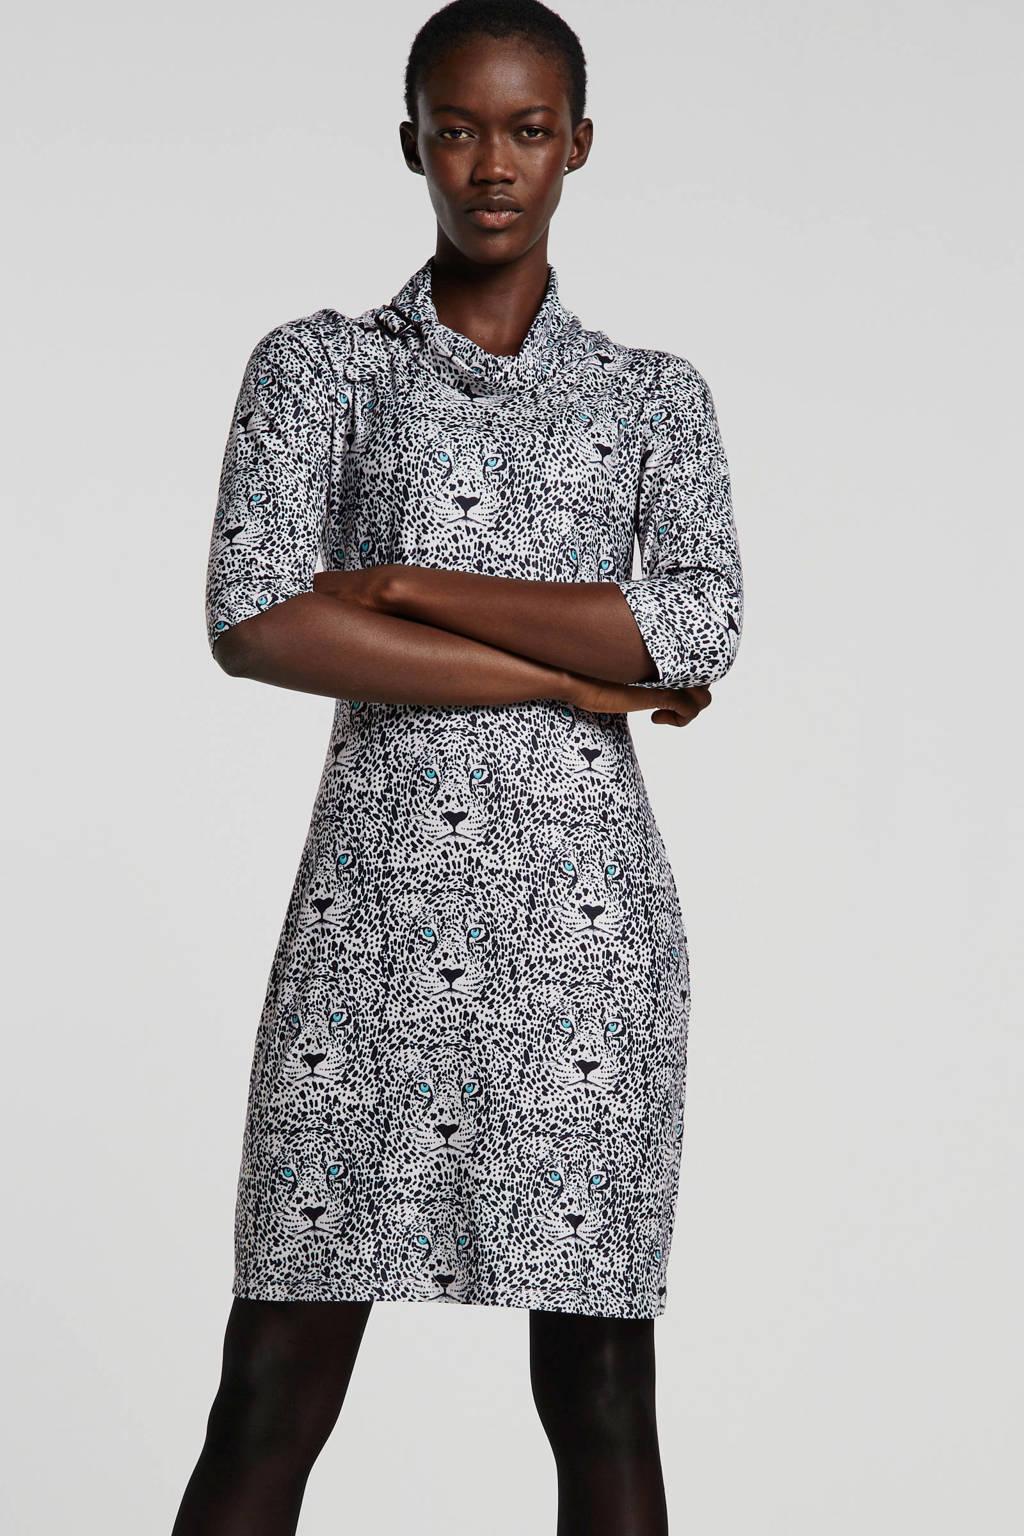 Smashed Lemon jersey jurk met all over print ecru, Ecru